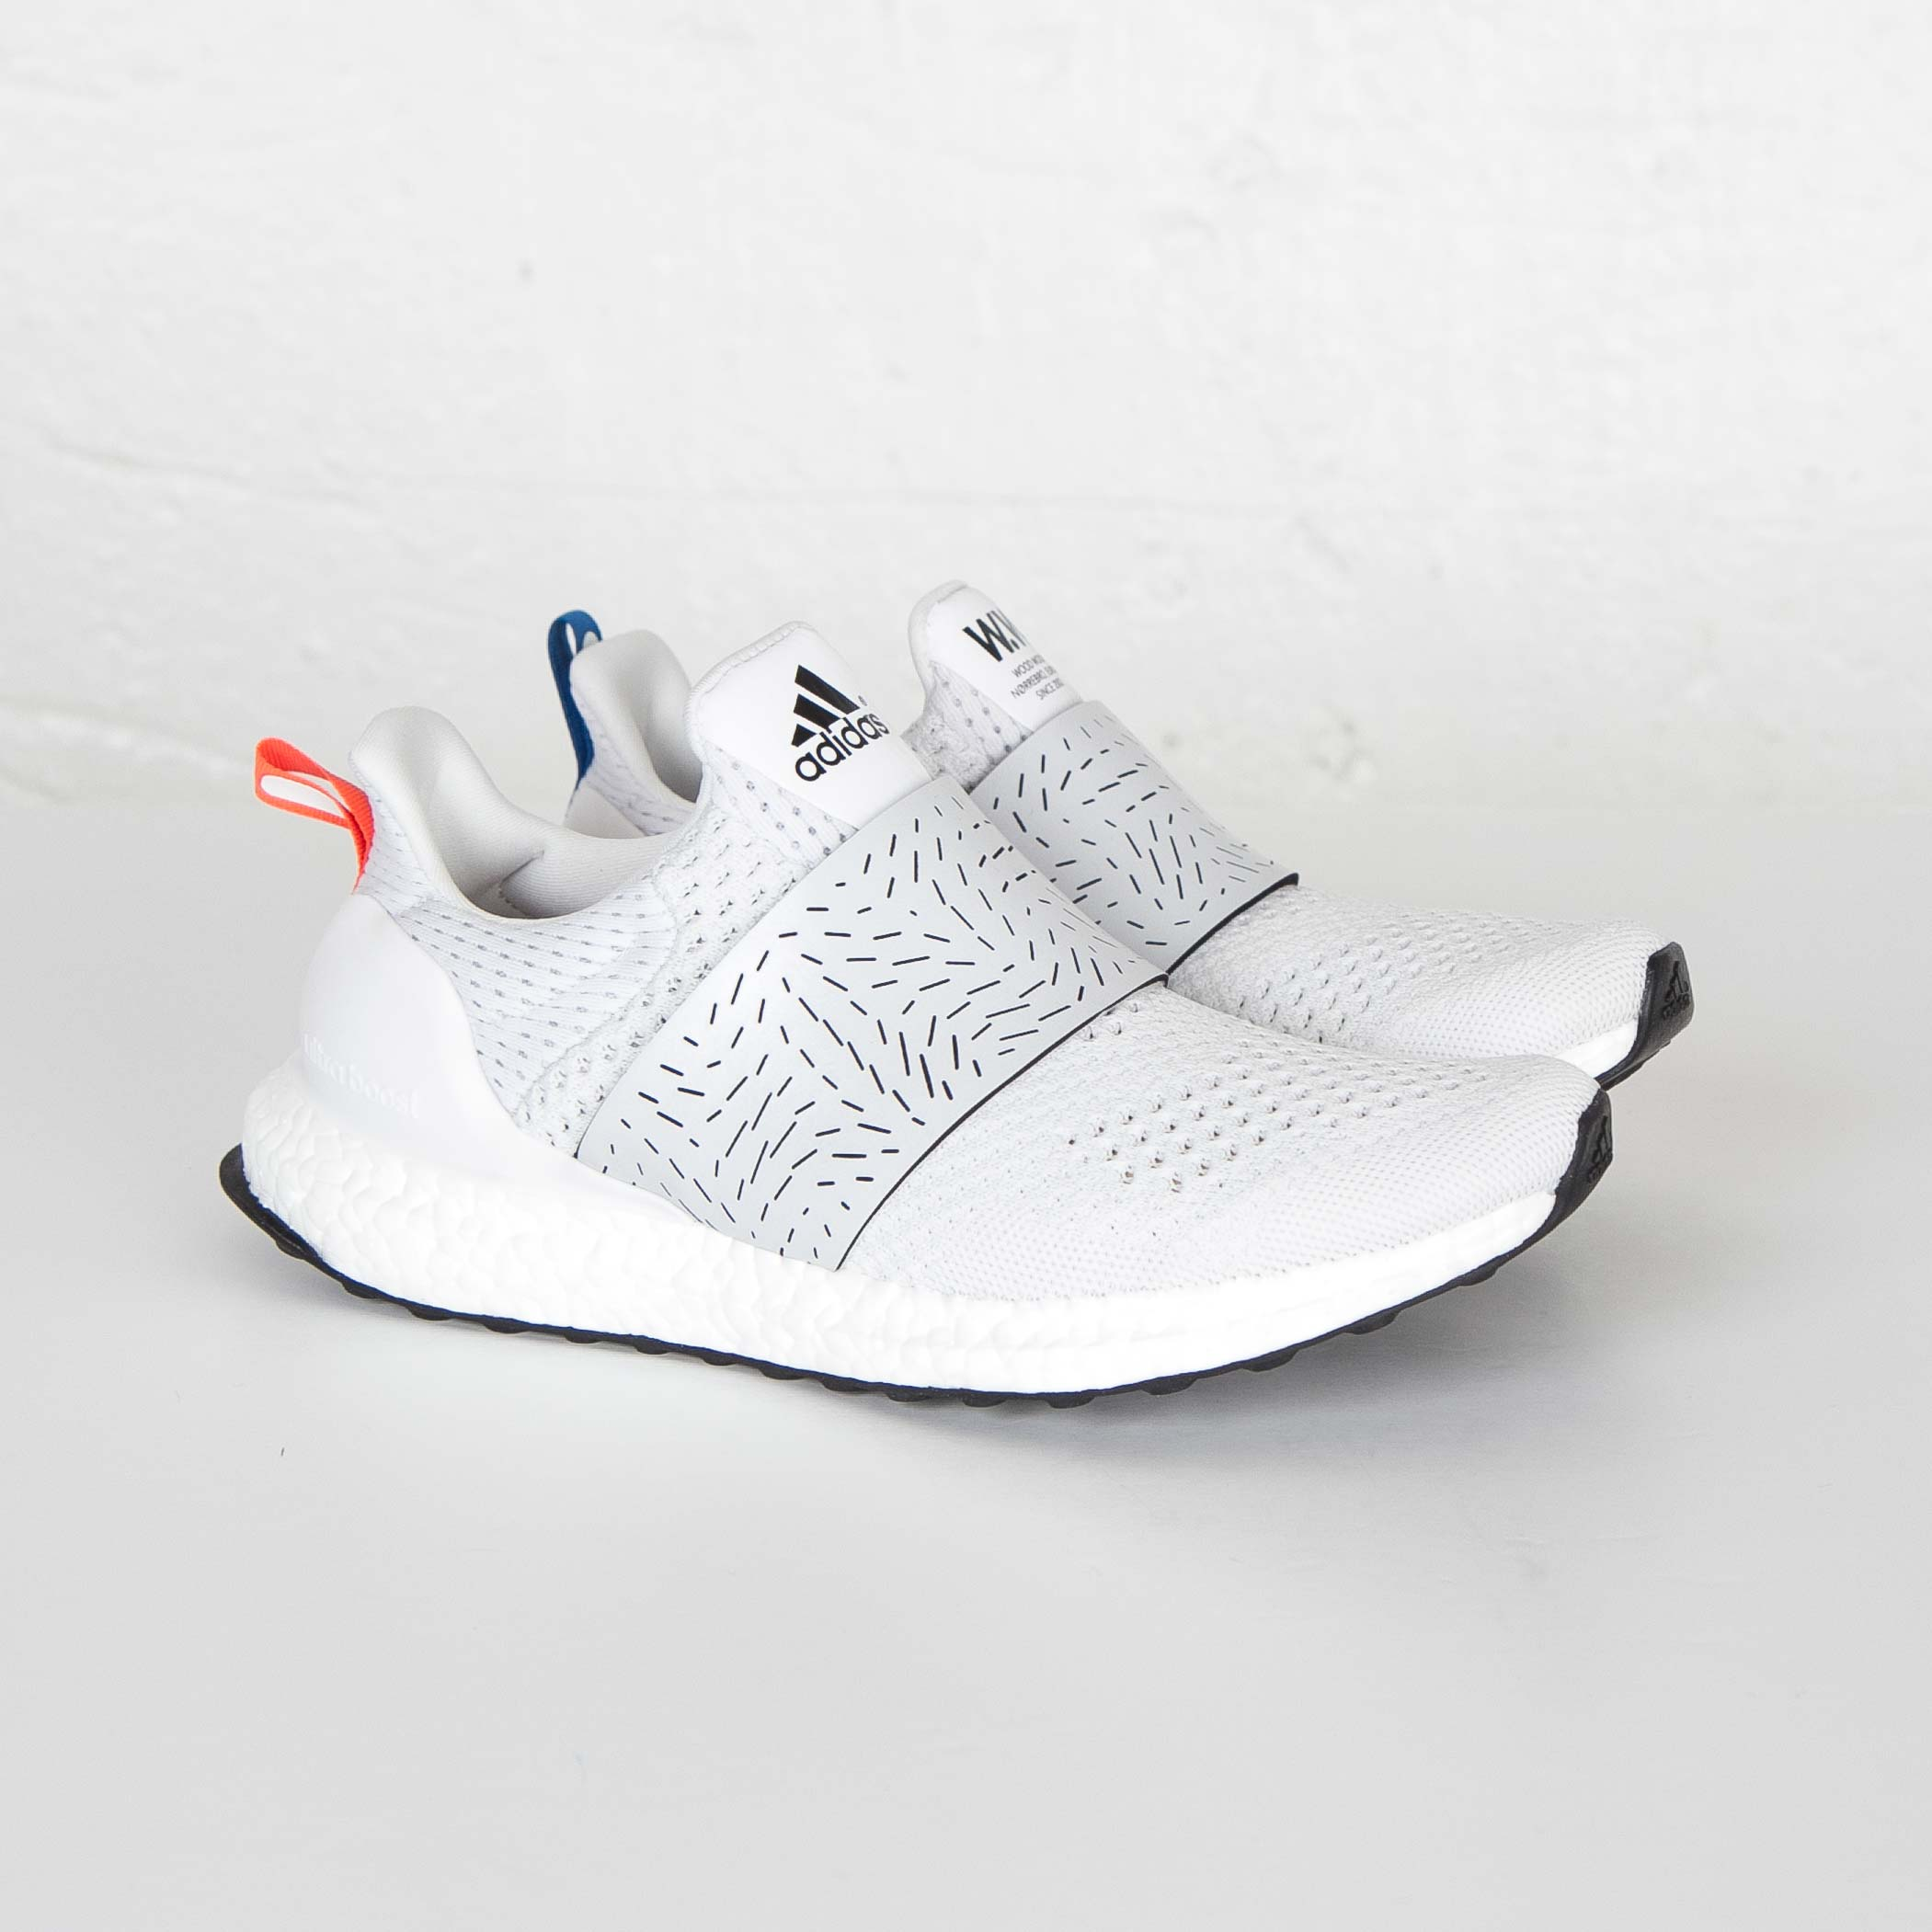 4982dfc09462b adidas Ultraboost W - Af5779 - Sneakersnstuff